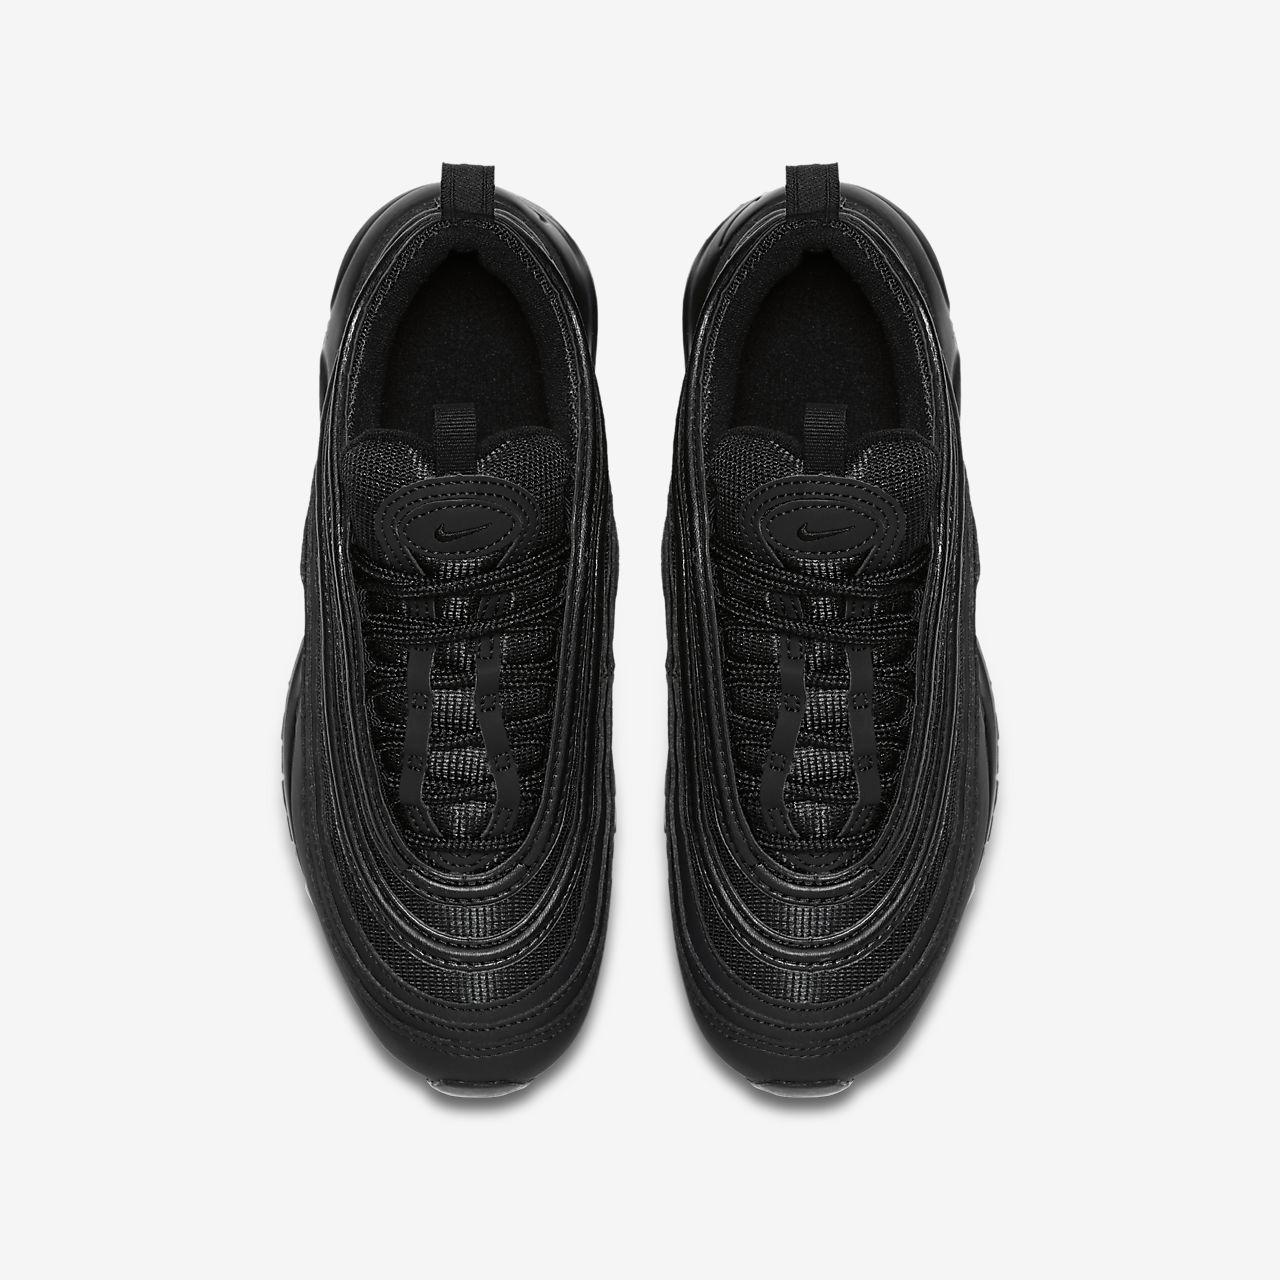 cheap for discount c23ca 8e5ab ... Nike Air Max 97 OG Older Kids  Shoe